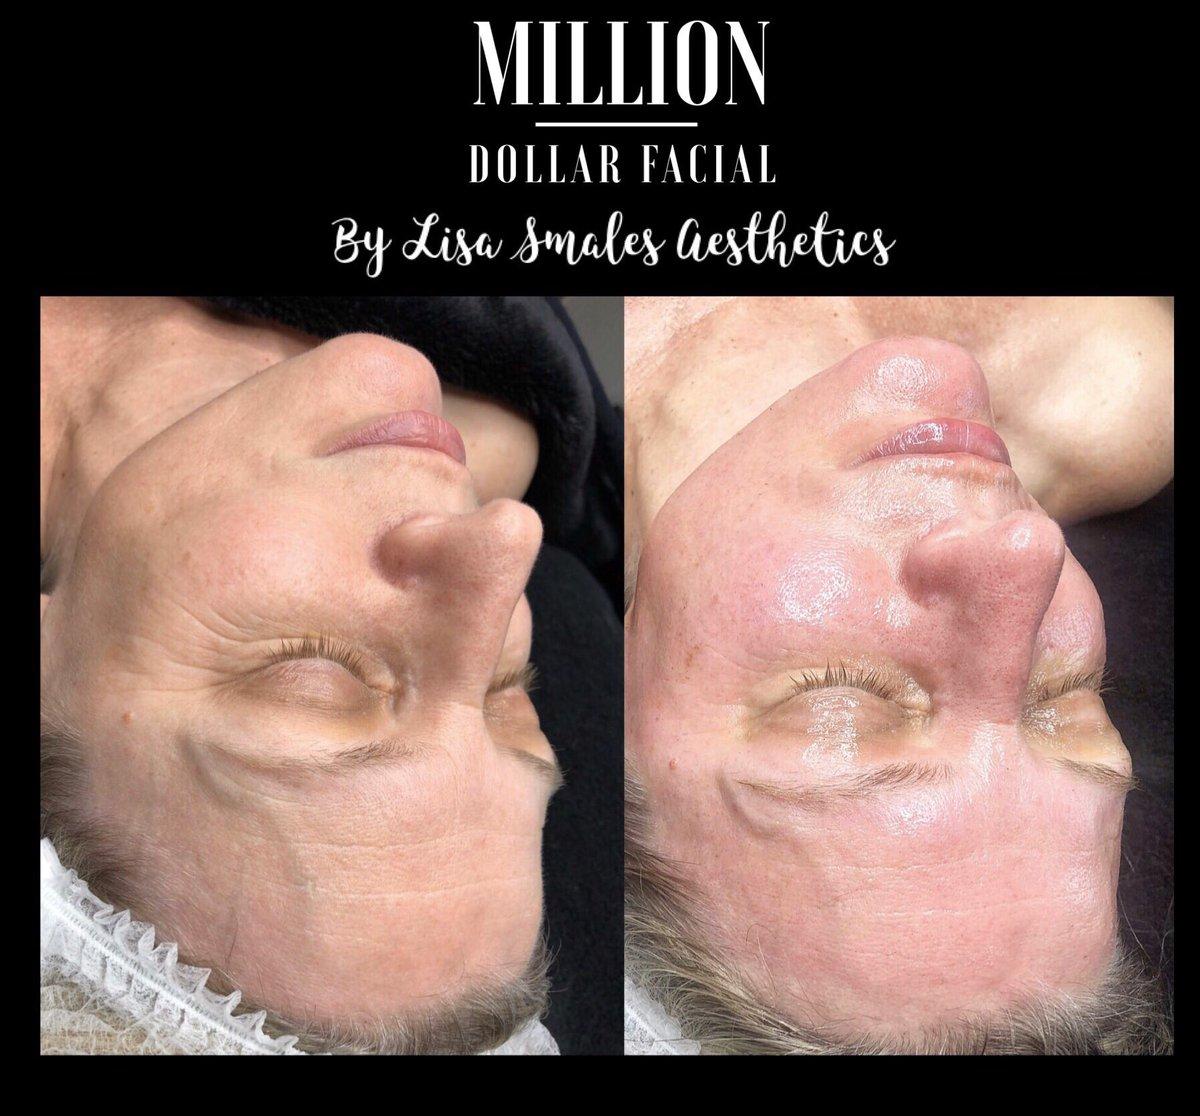 Looking and feeling a Million Dollars #Milliondollarfacials #milliondollarfacial #Carbonpeel #miraclemask #dermaplane #dermaplaning #skincare #facial #beauty #hydrafacial #dermaplaningfacial #facials #microneedling #skinneedlng  #skintherapist #glowingskin  #chemicalpeel #leedspic.twitter.com/6qkwChb429